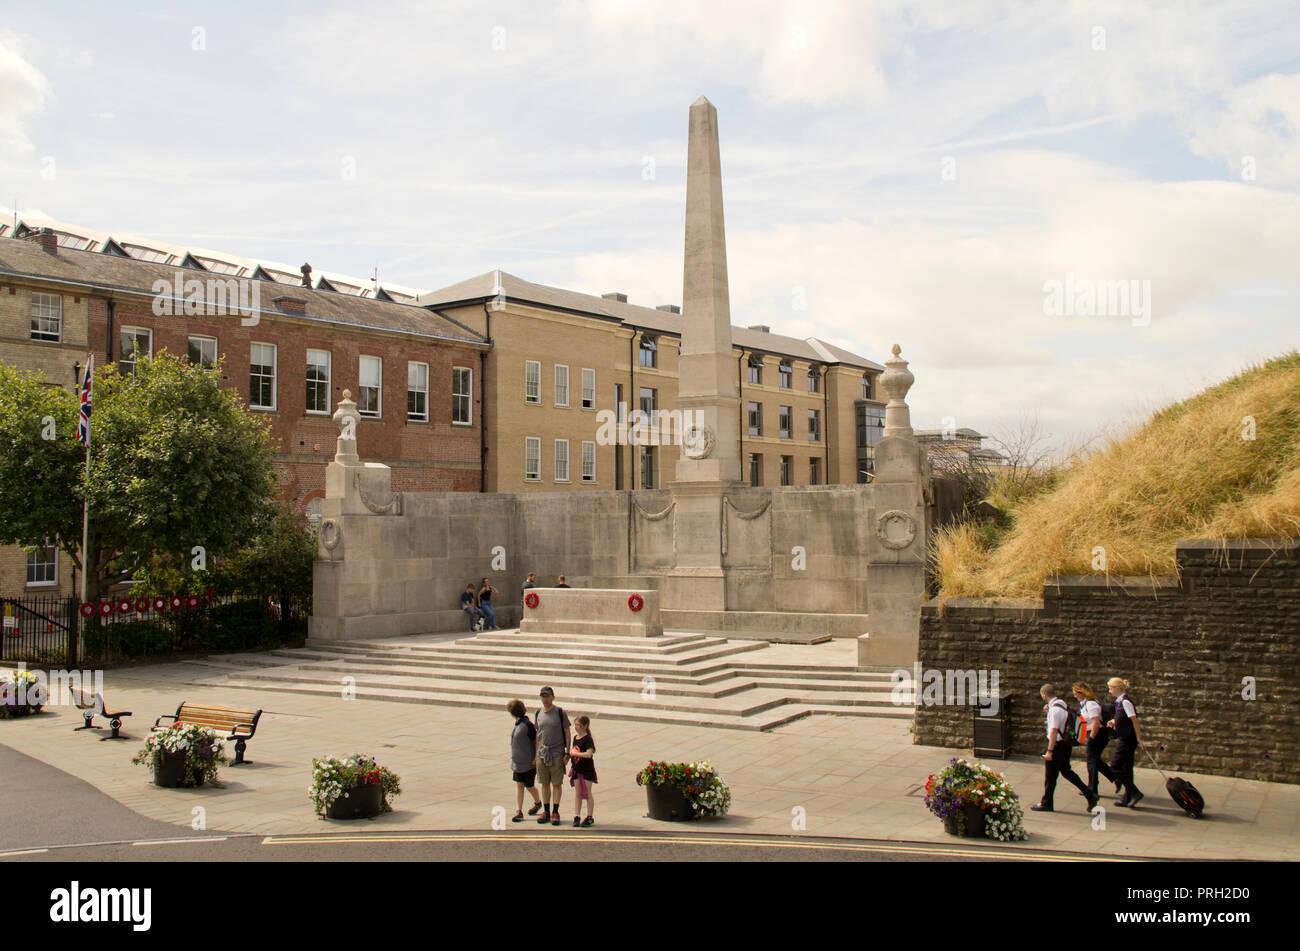 North Eastern Railway War Memorial York - Stock Image